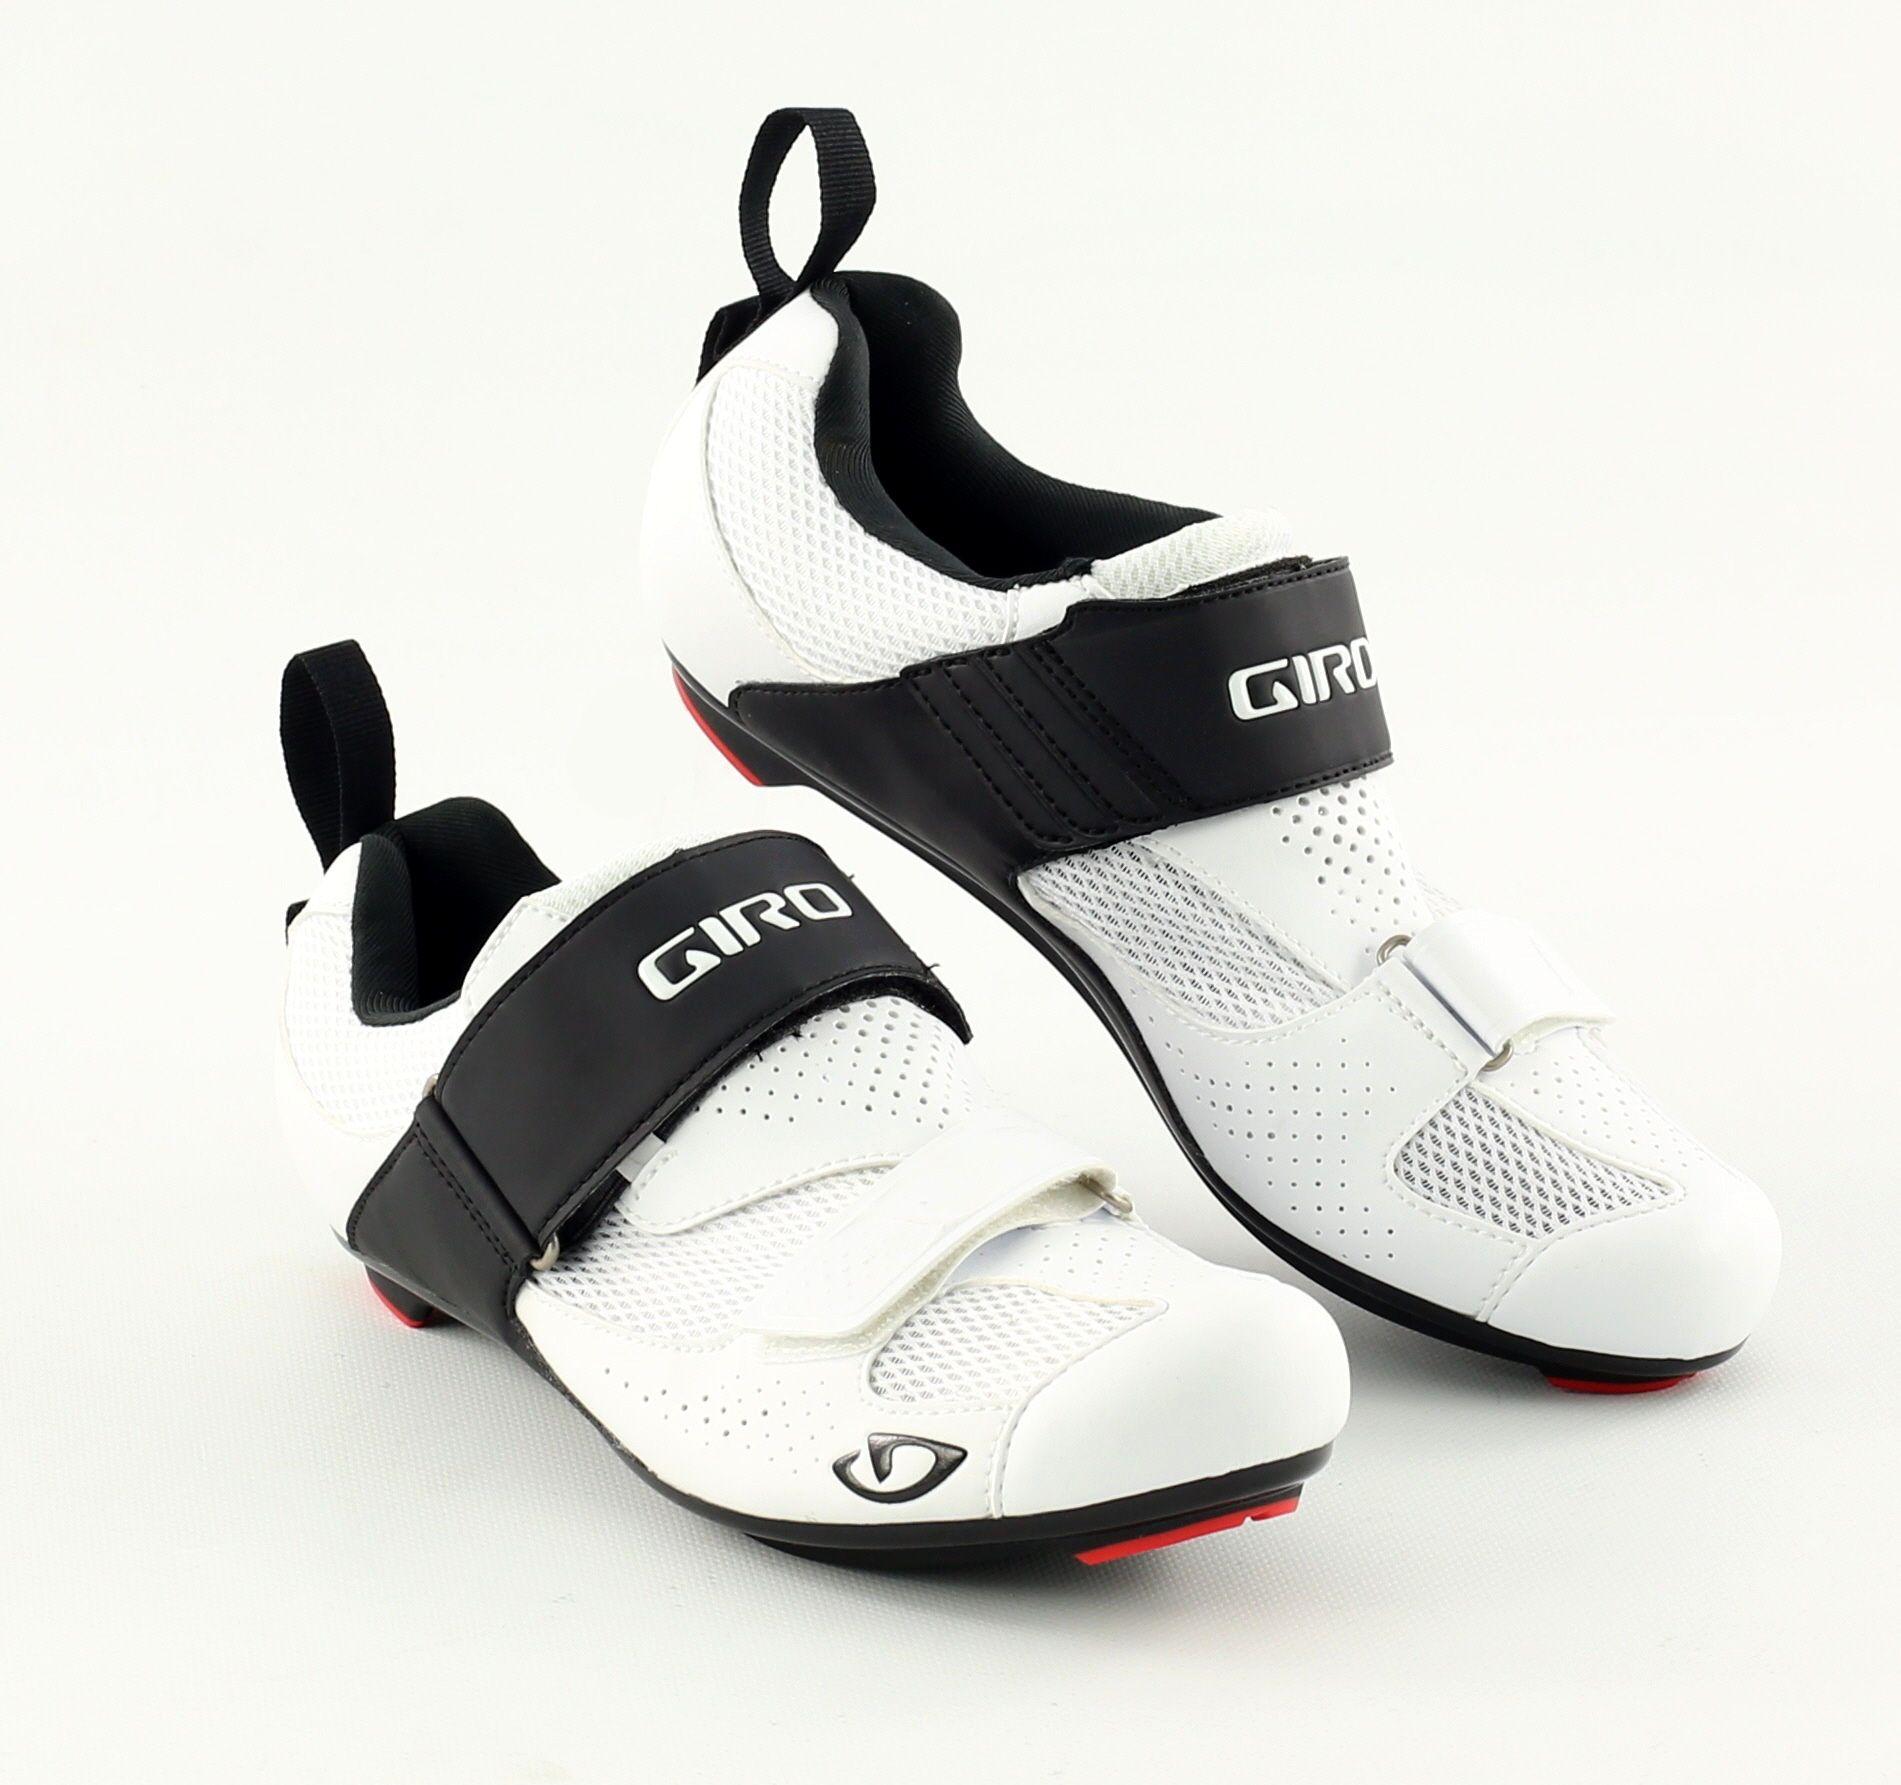 Chaussures route Giro Inciter TRI Blanc/Noir - 41